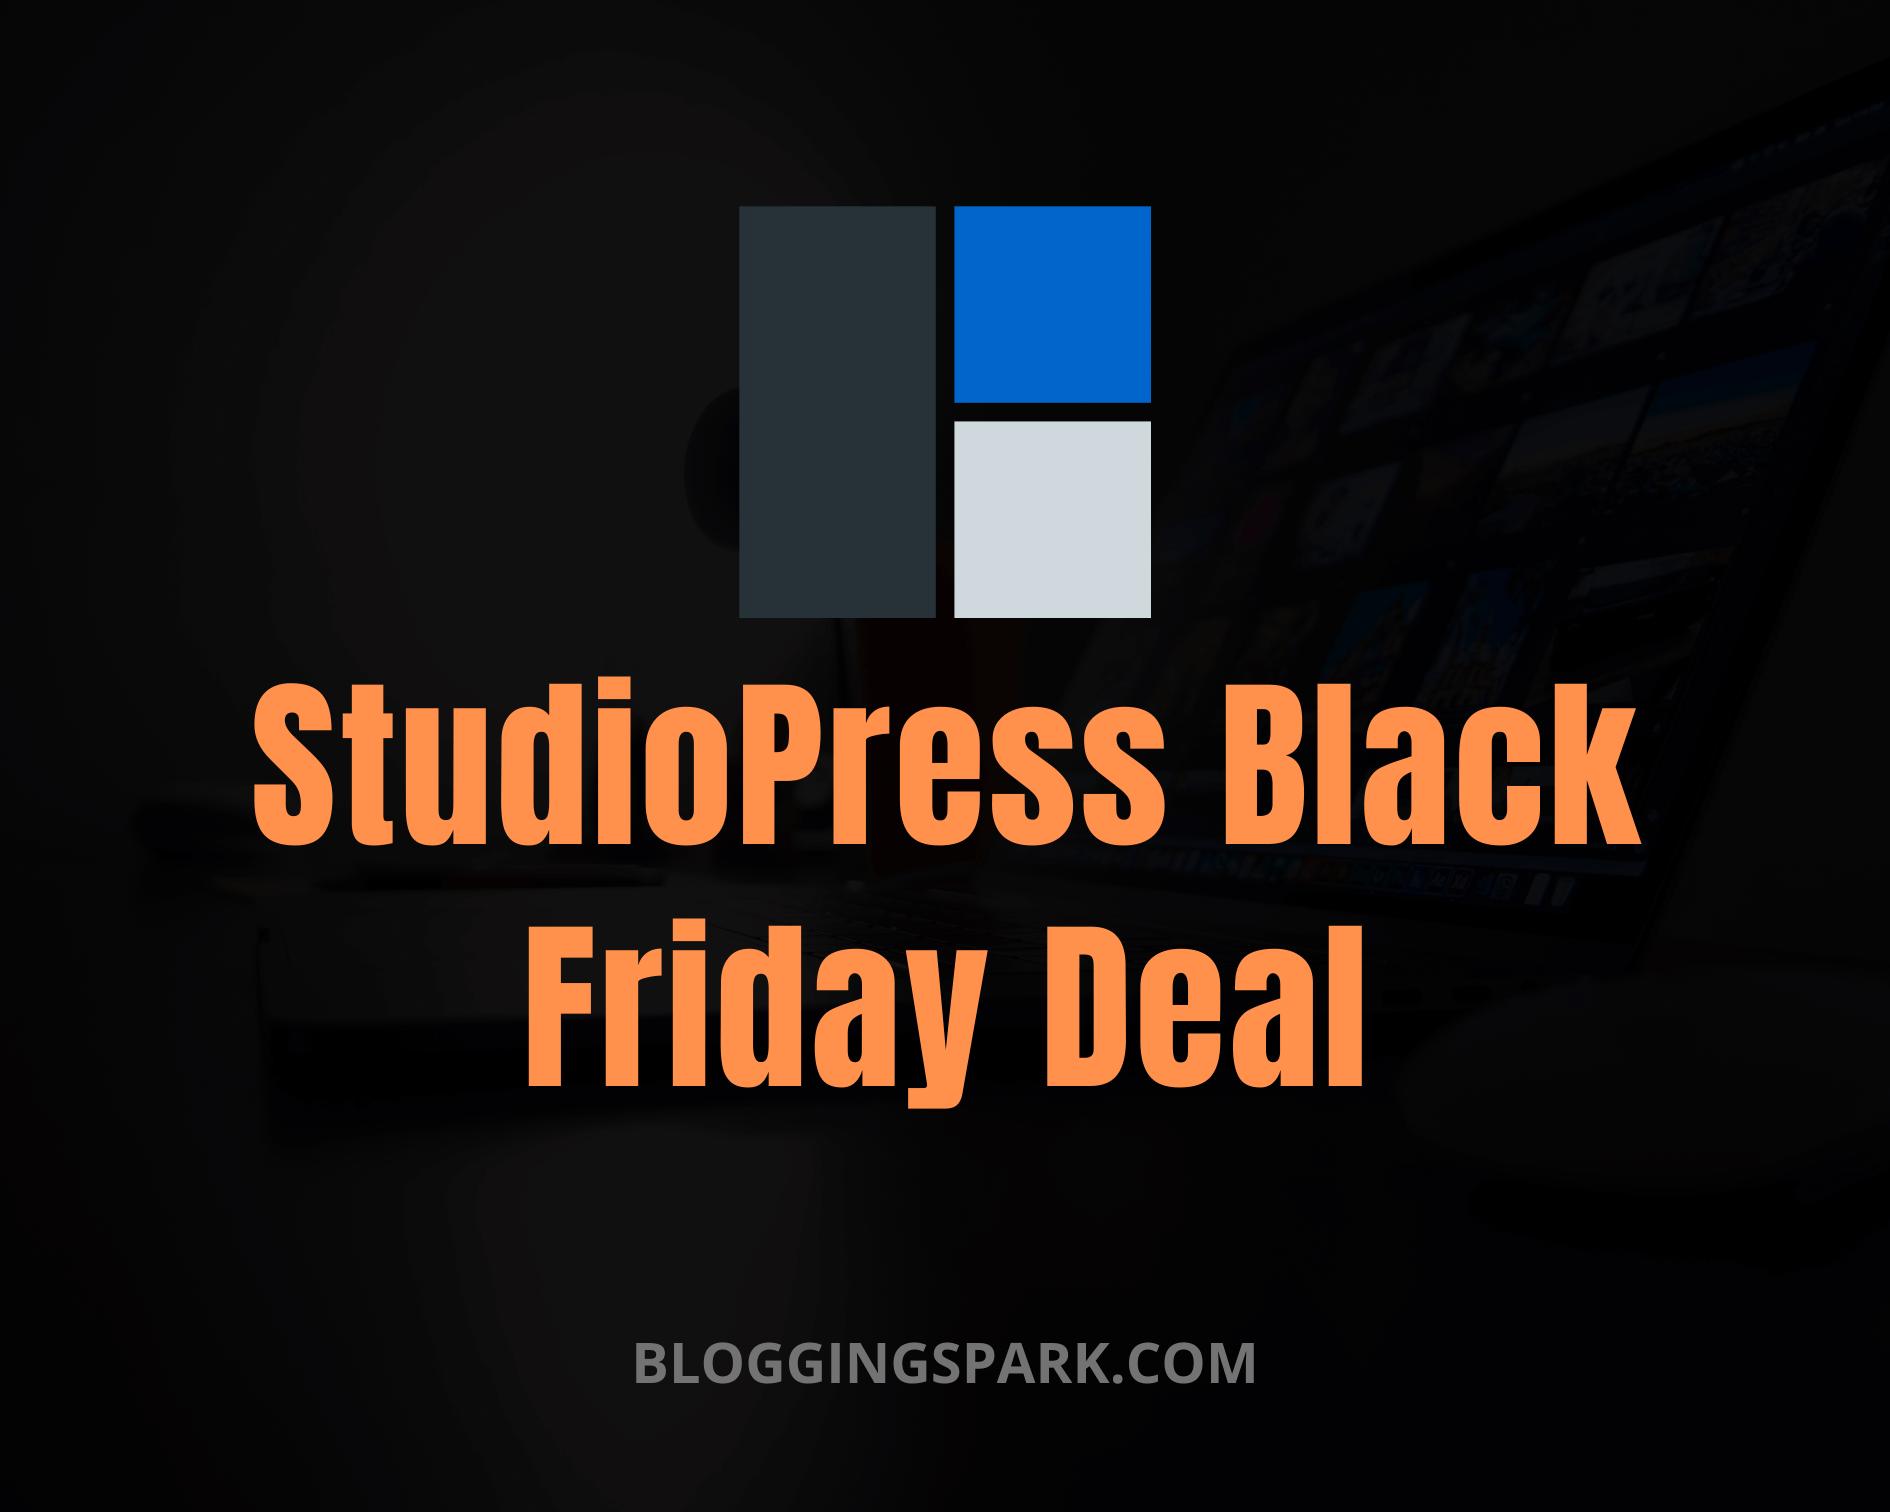 StudioPress Black Friday 2020 Deal Discount